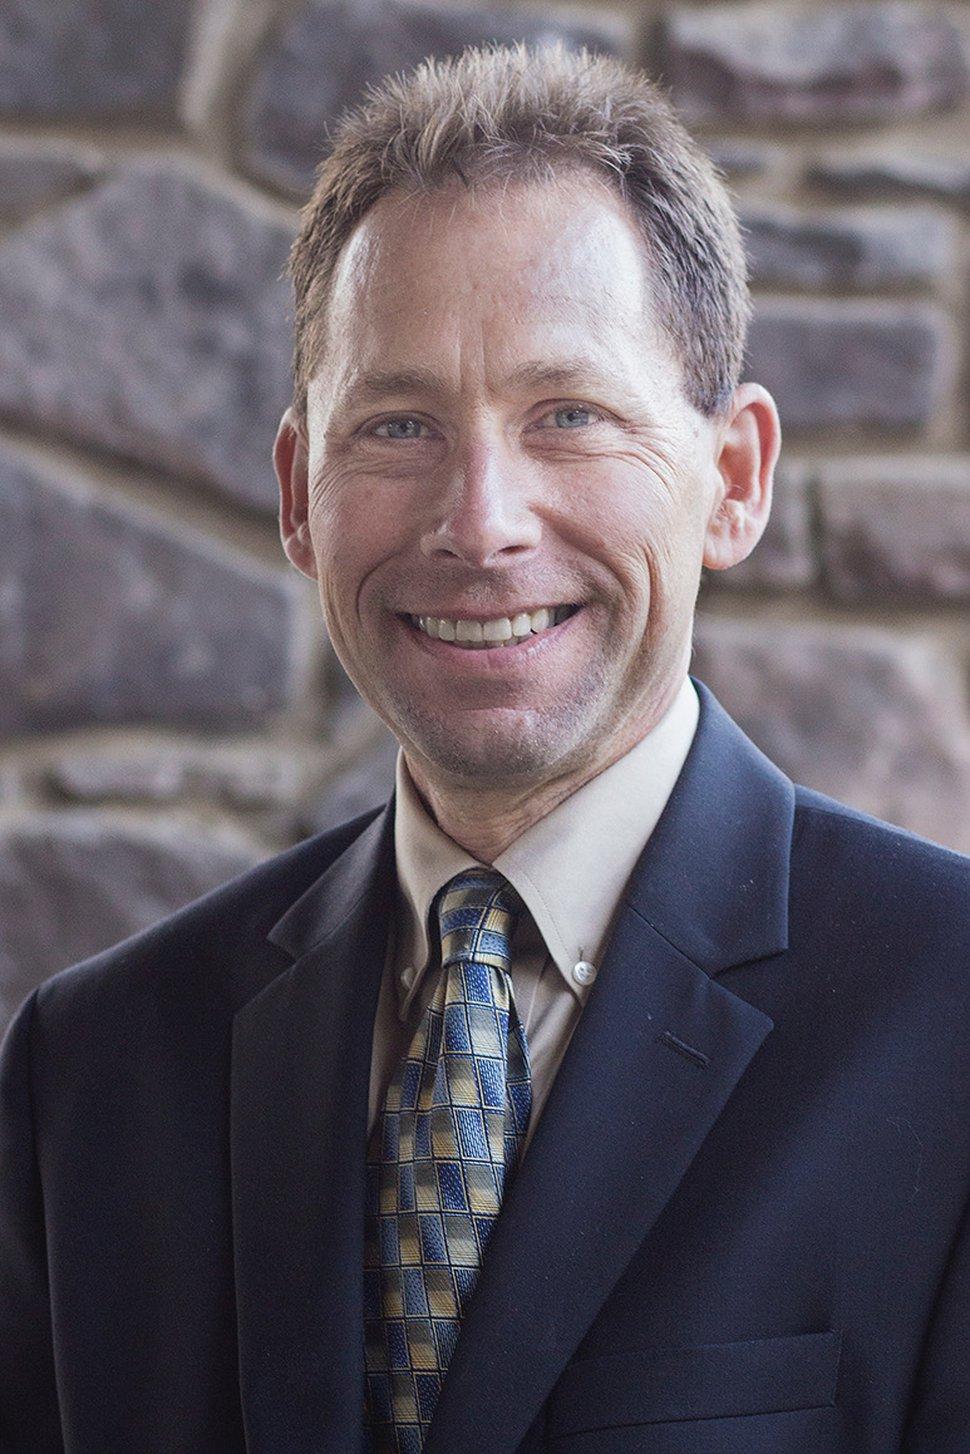 Brian Zehnder